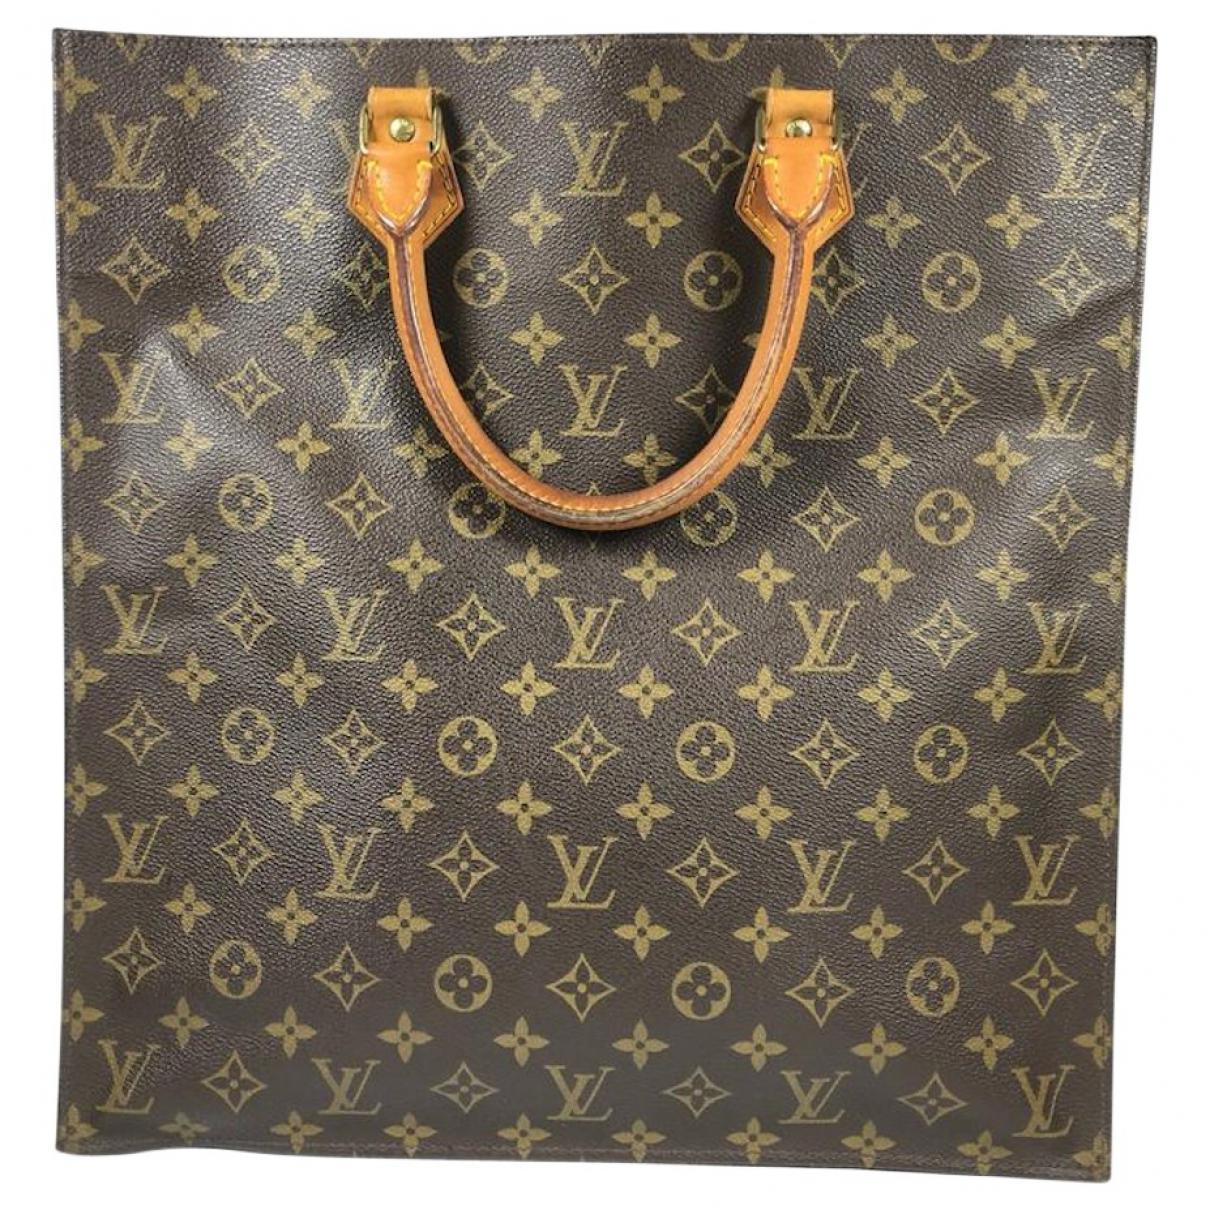 Pre-owned - Plat cloth bag Louis Vuitton YFTPY